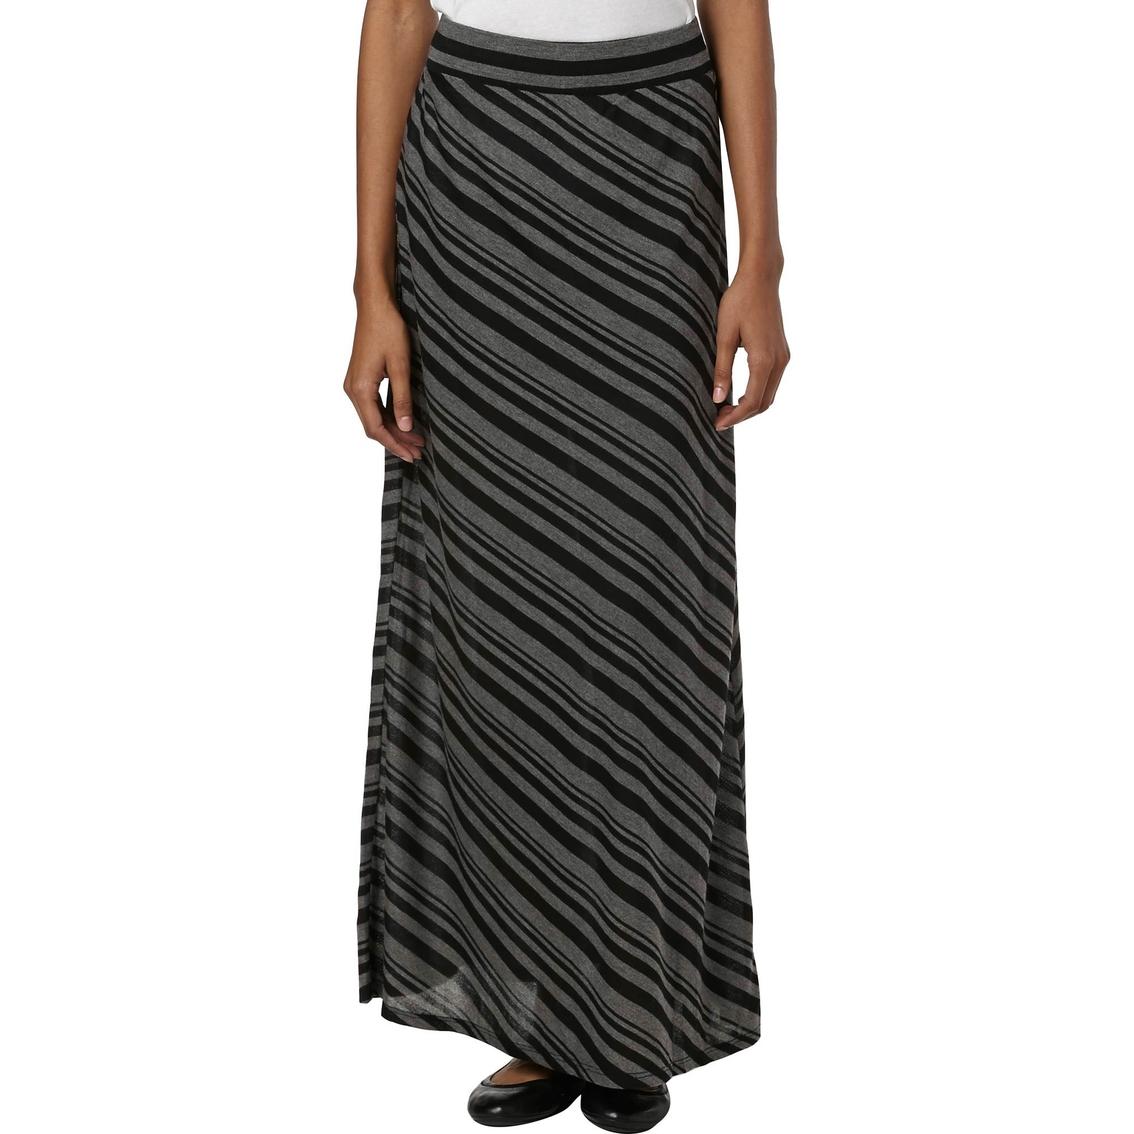 joe b juniors hacci maxi skirt skirts apparel shop